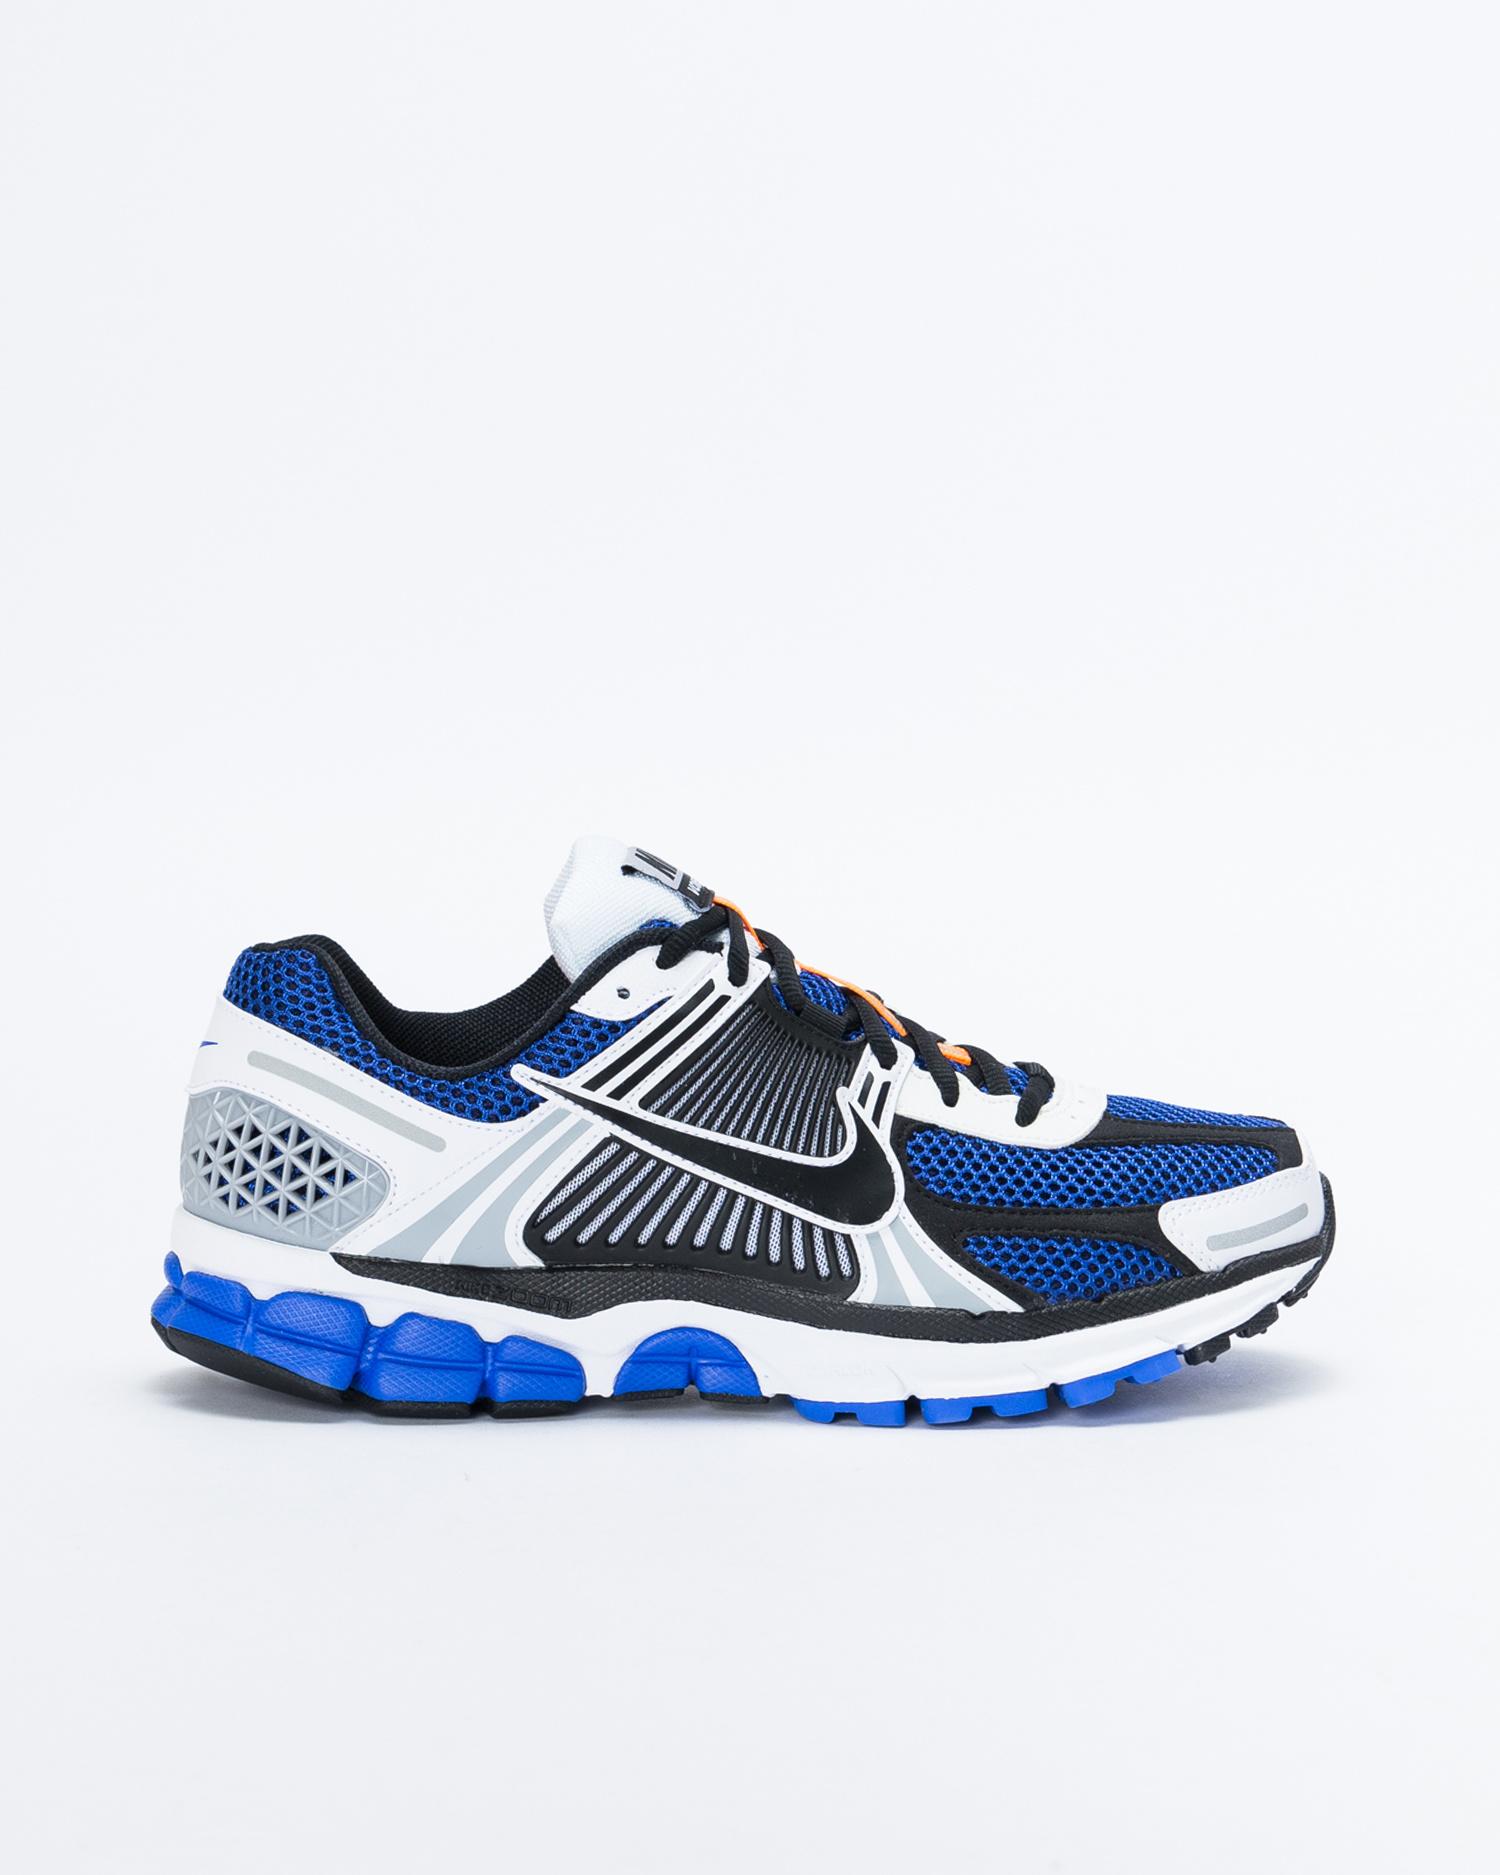 Nike Zoom Vomero 5 Se SP White/Racer Blue-Black-Sail